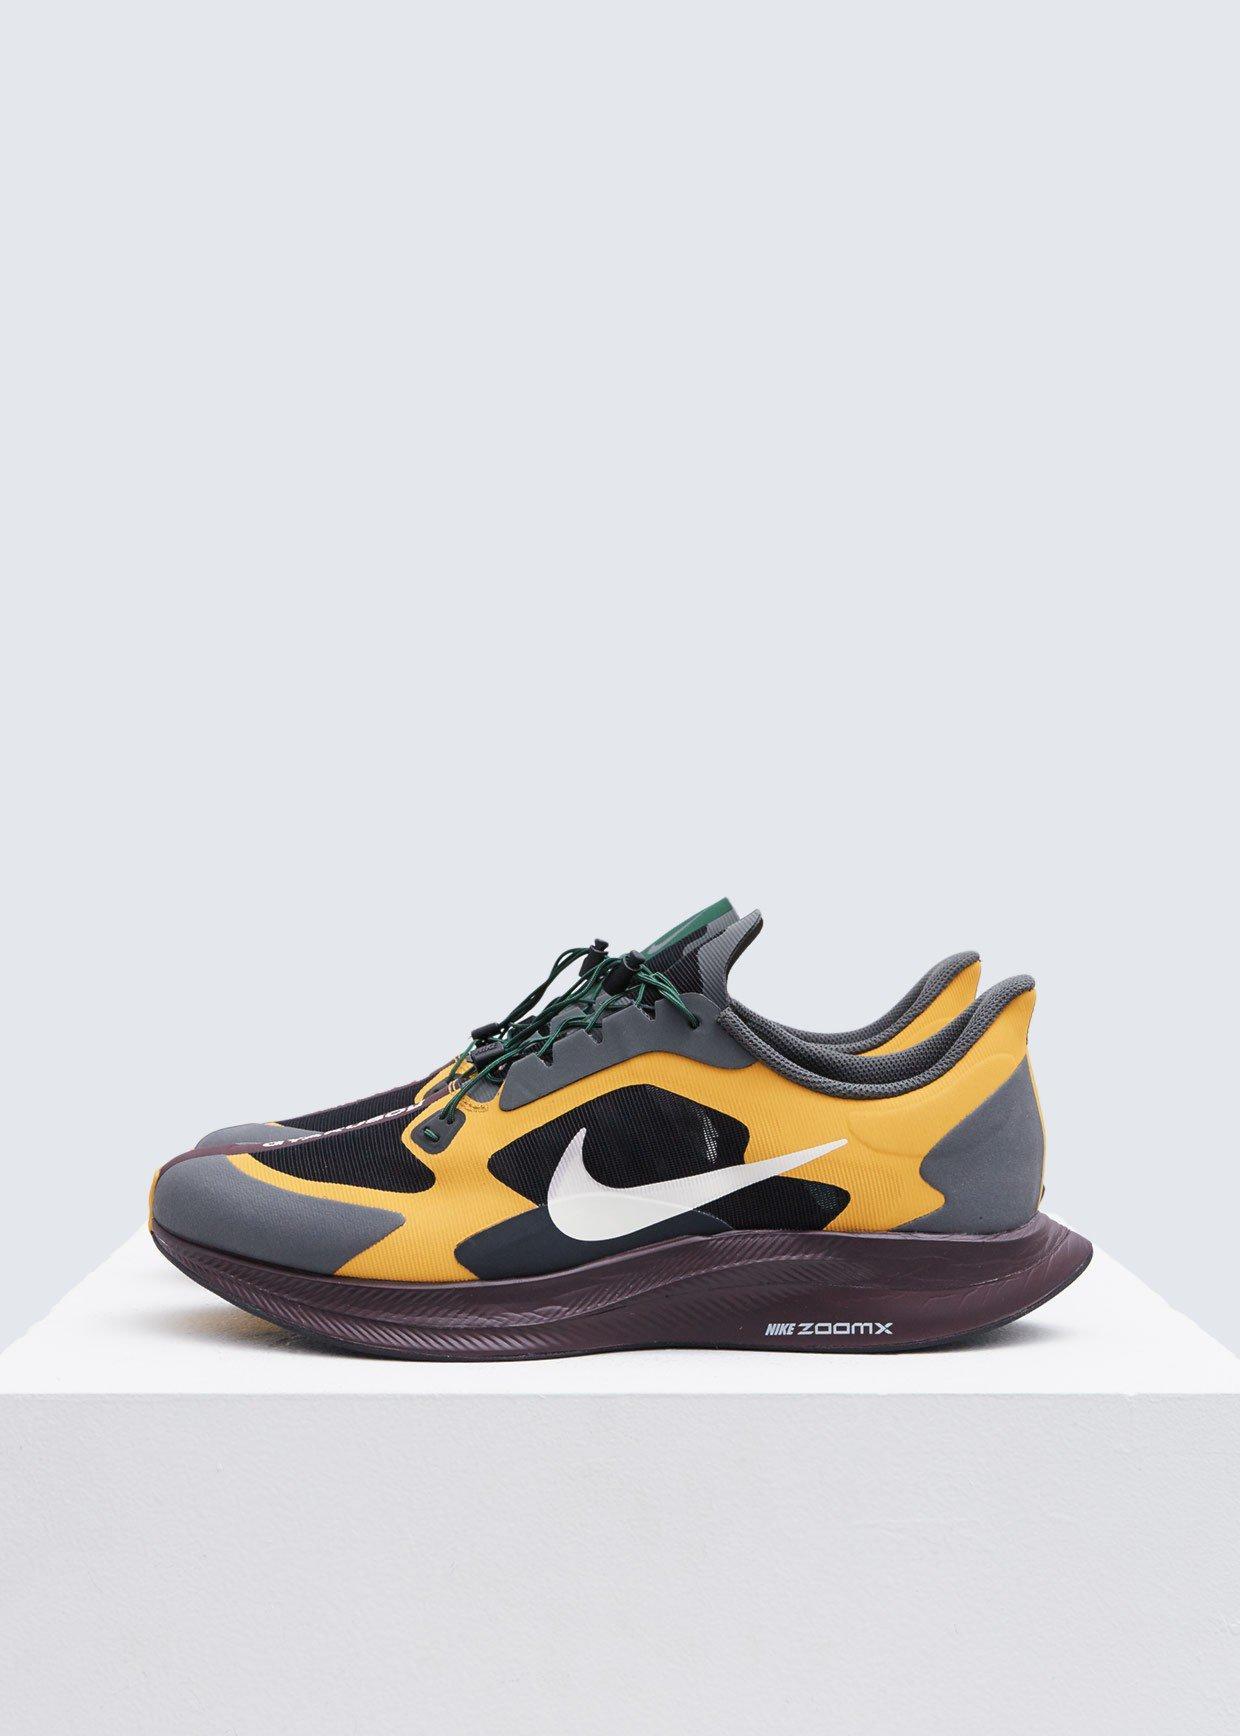 42b9d3e32720 Nike Gyakusou Zoom Pegasus 35 Turbo Sneaker in Gray for Men - Lyst